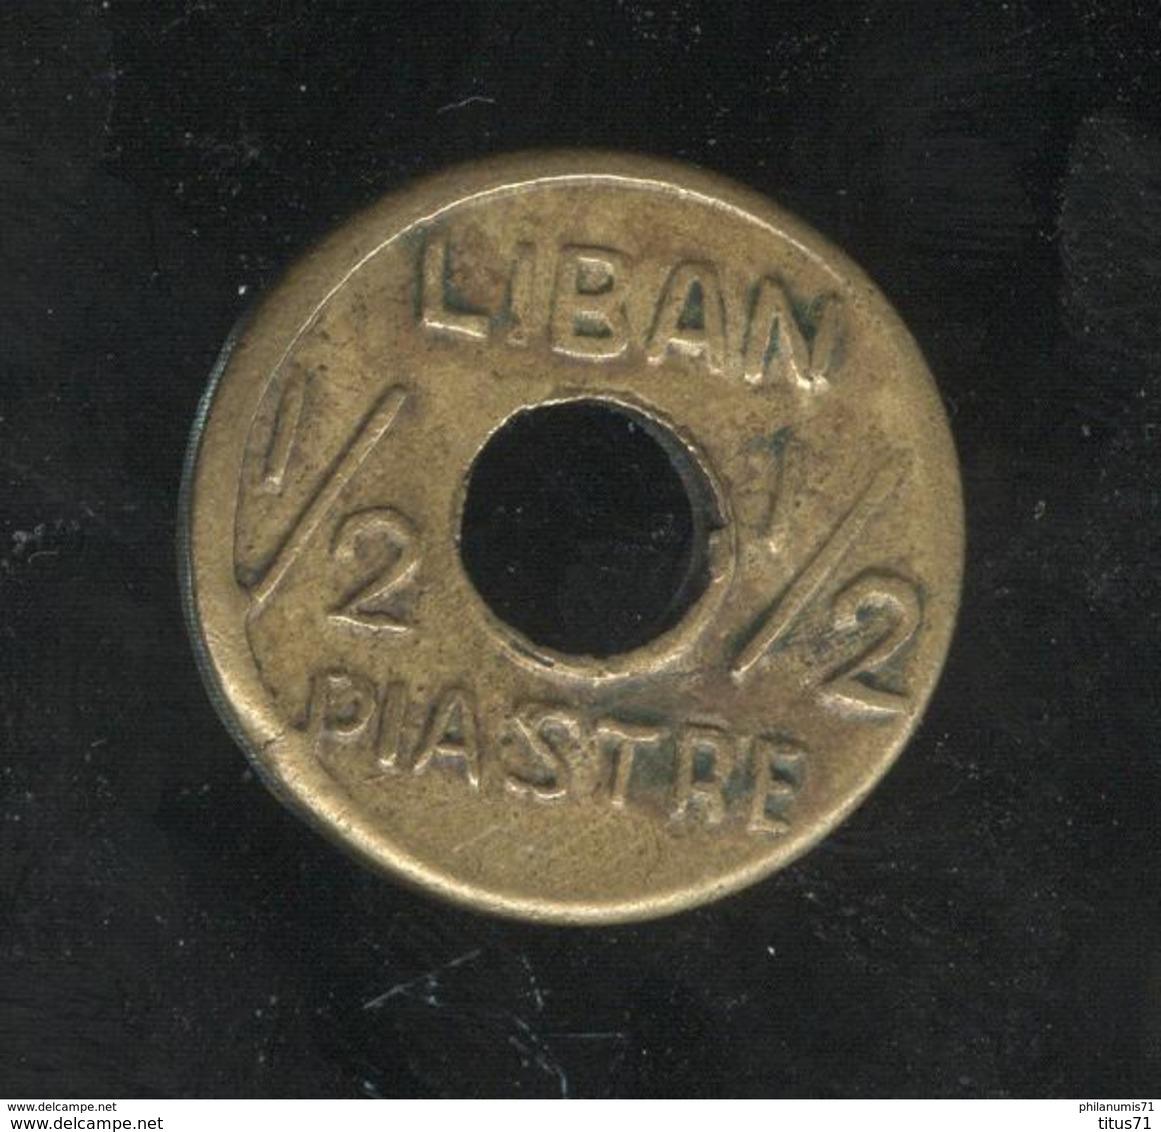 1/2 Piastre Liban / Lebanon 1942 - 1945 - Liban